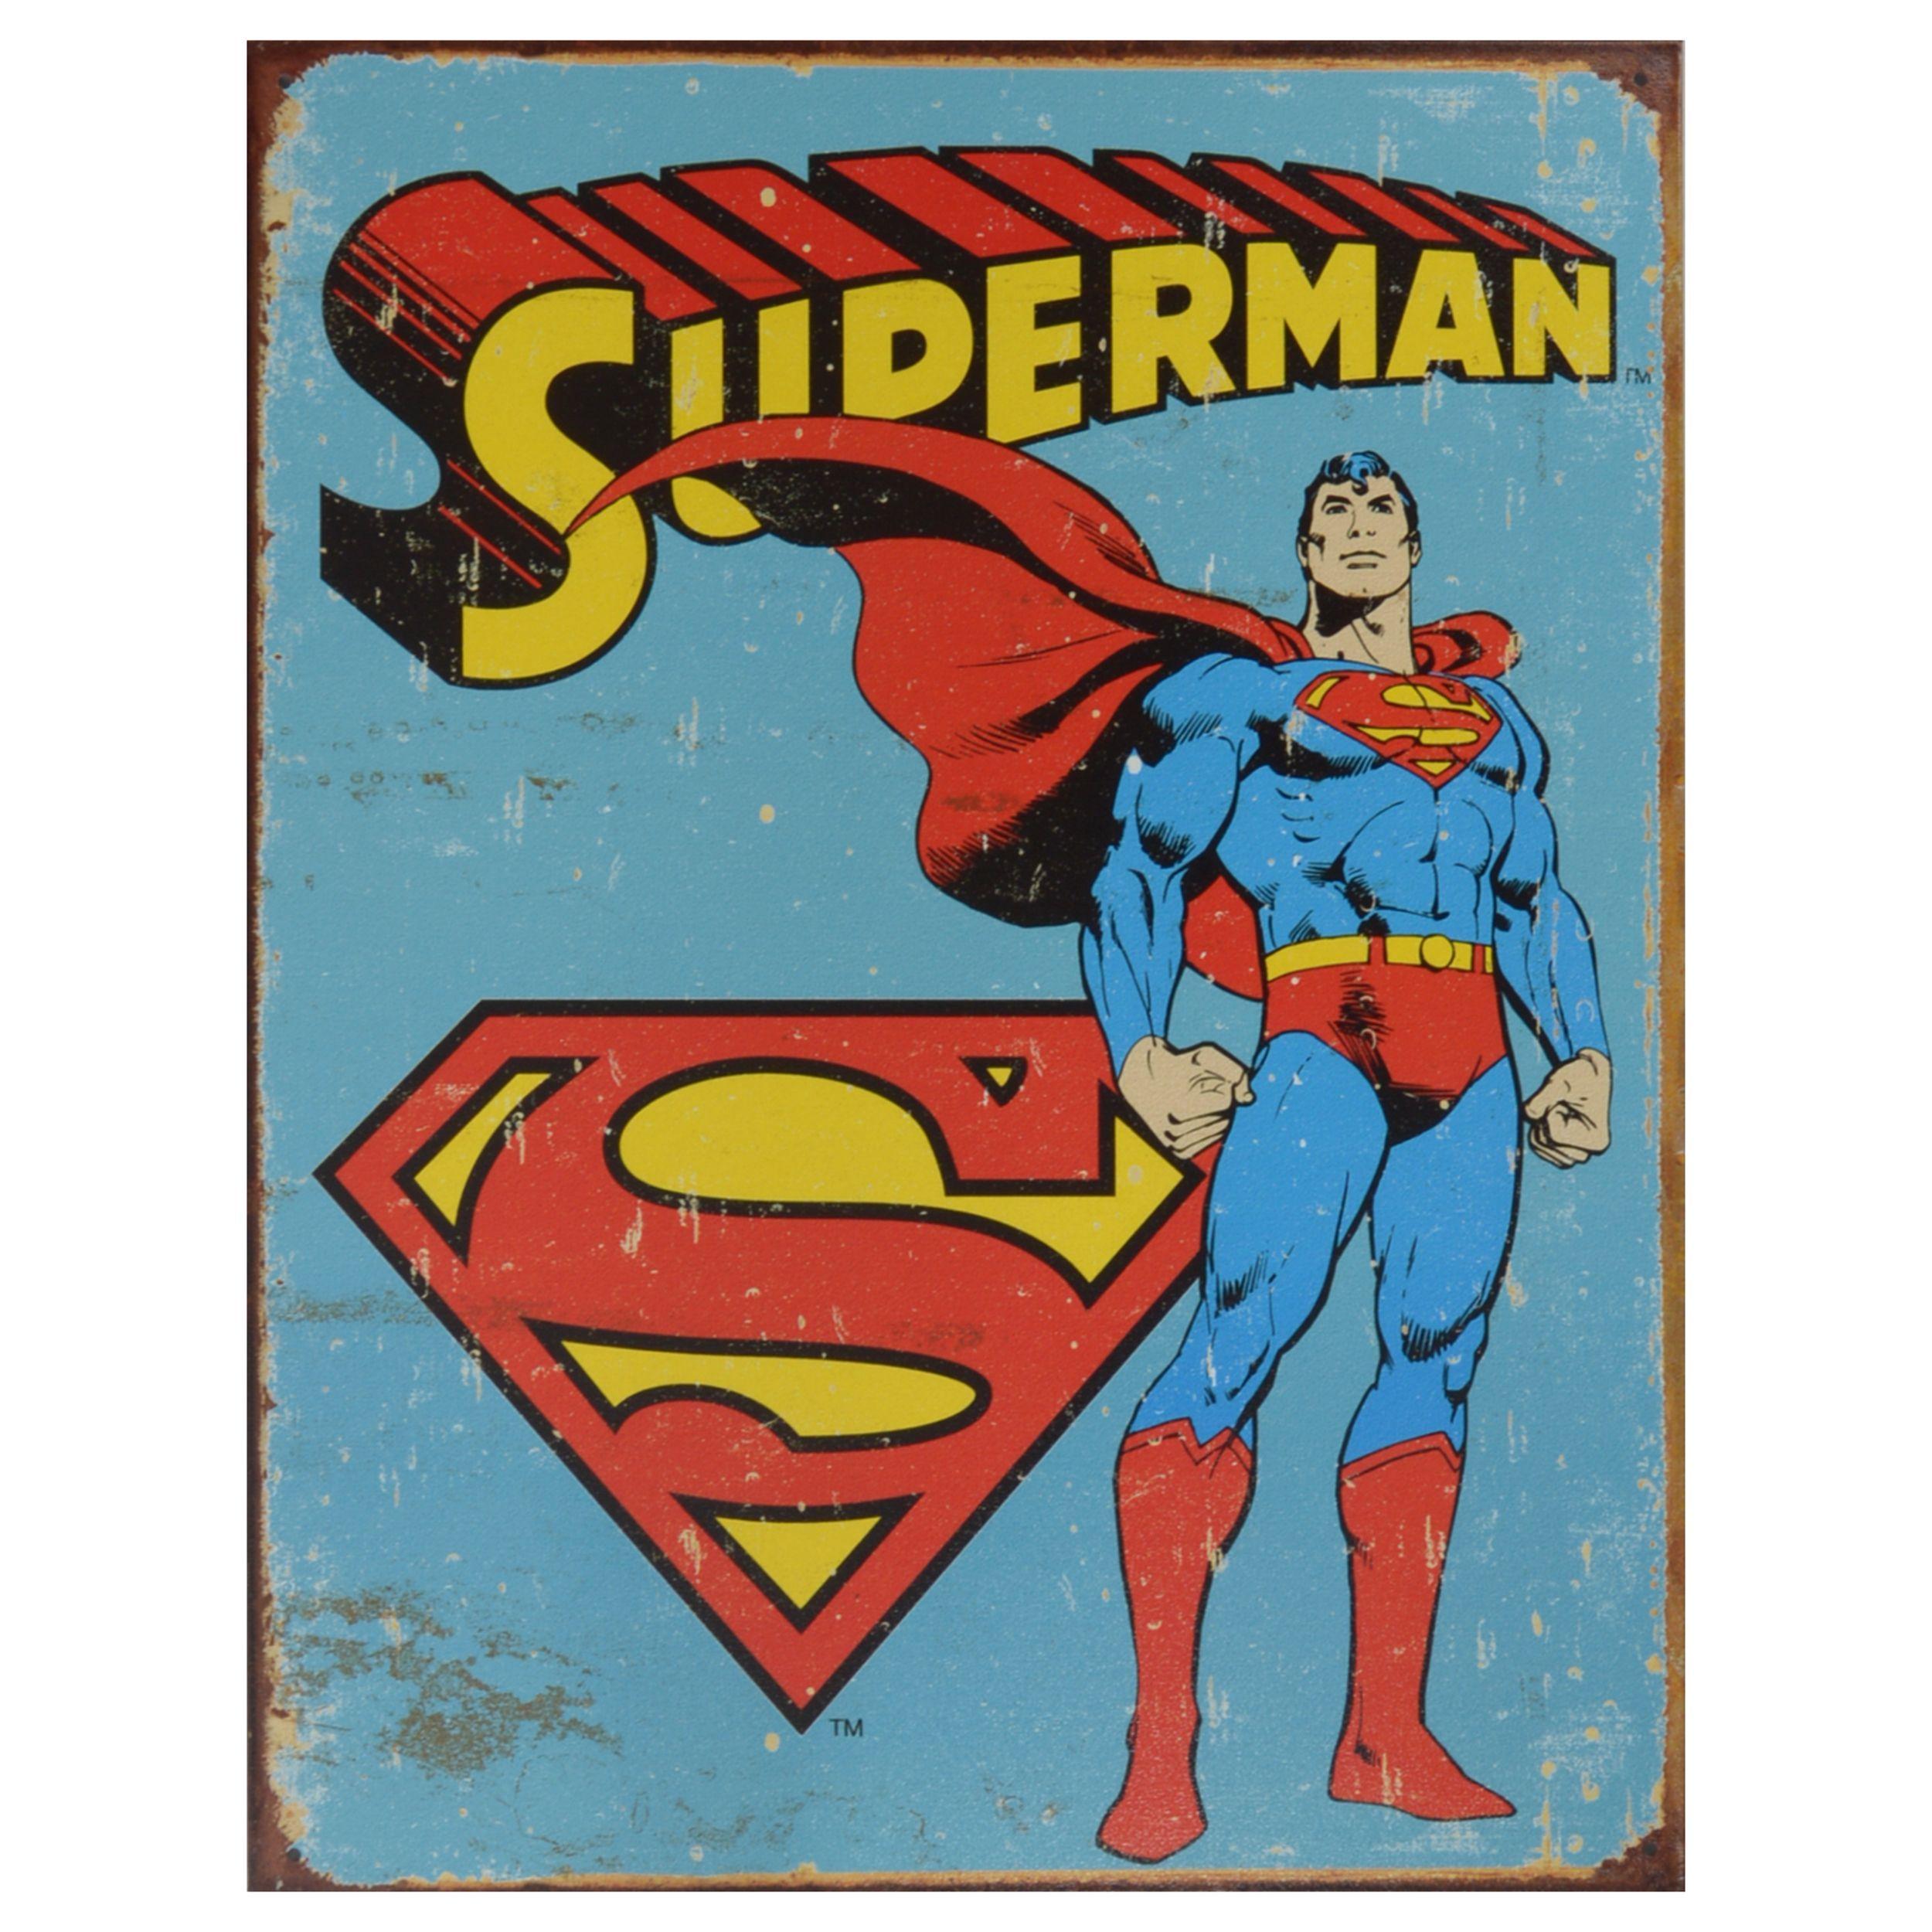 Retro Superhero Art: DC Comics Vintage Art 'Superman' Decorative Retro Tin Sign